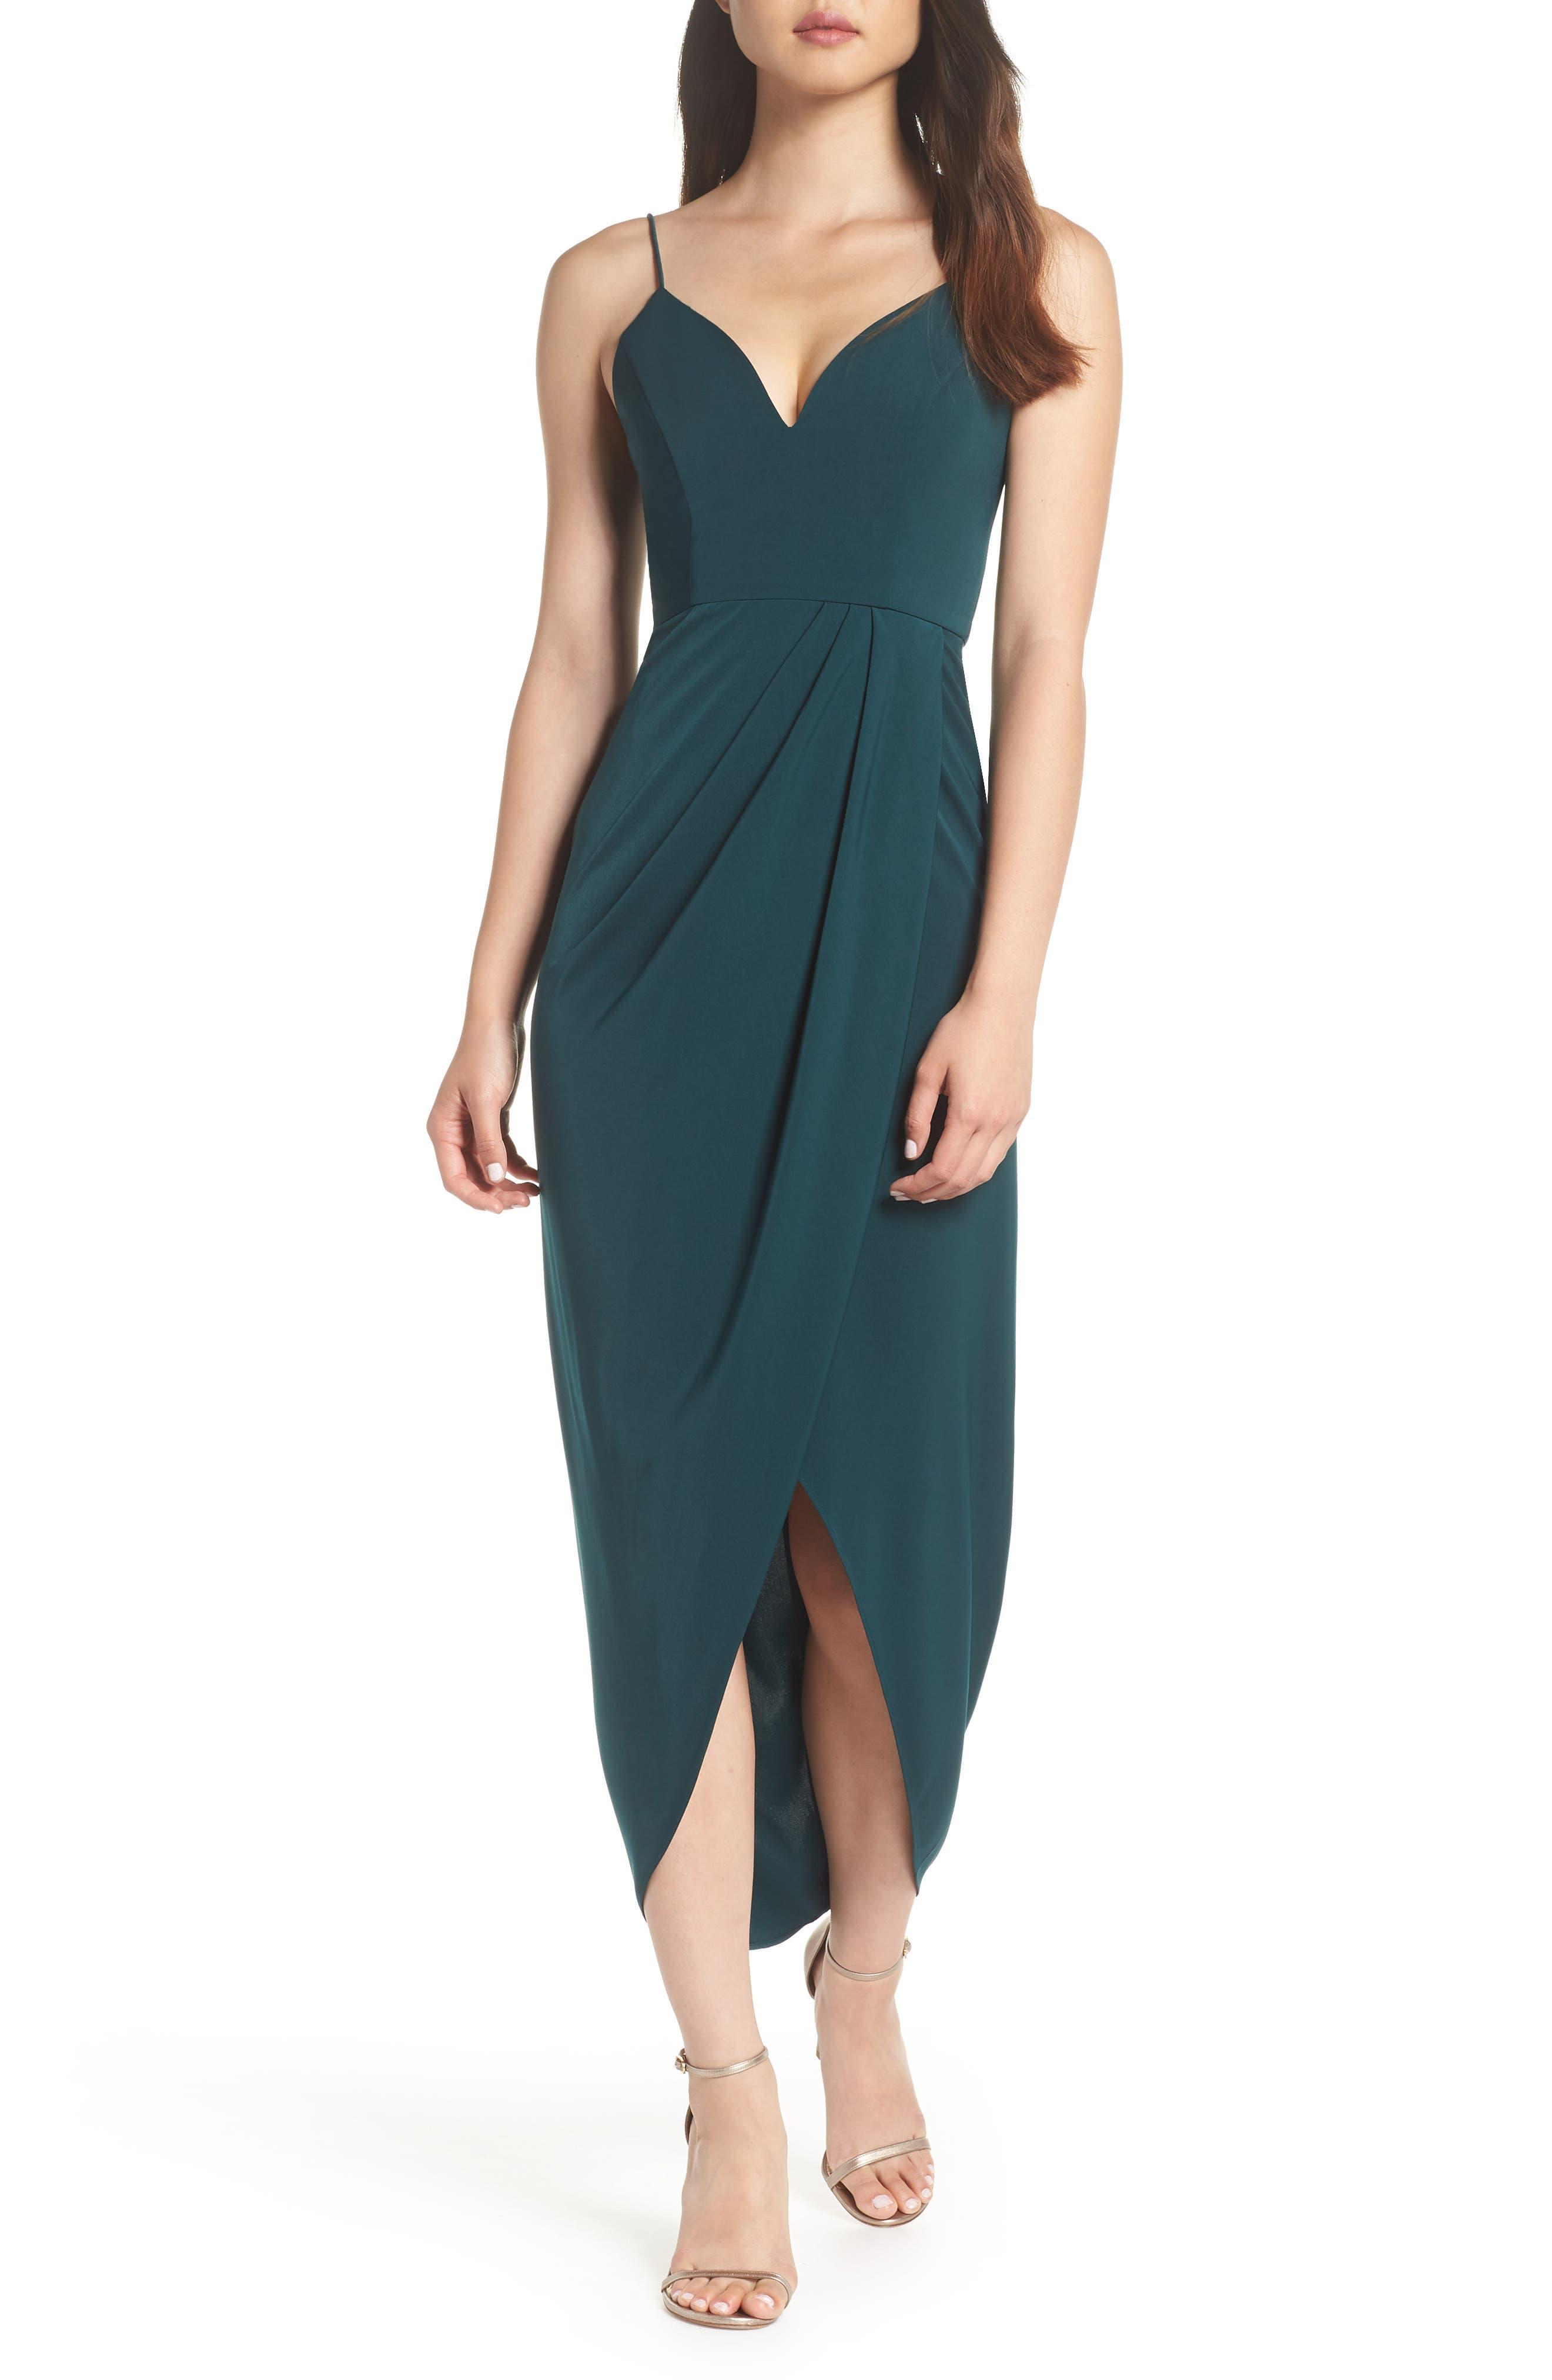 SHONA JOY, Tulip Hem Maxi Dress, Main thumbnail 1, color, SEAWEED